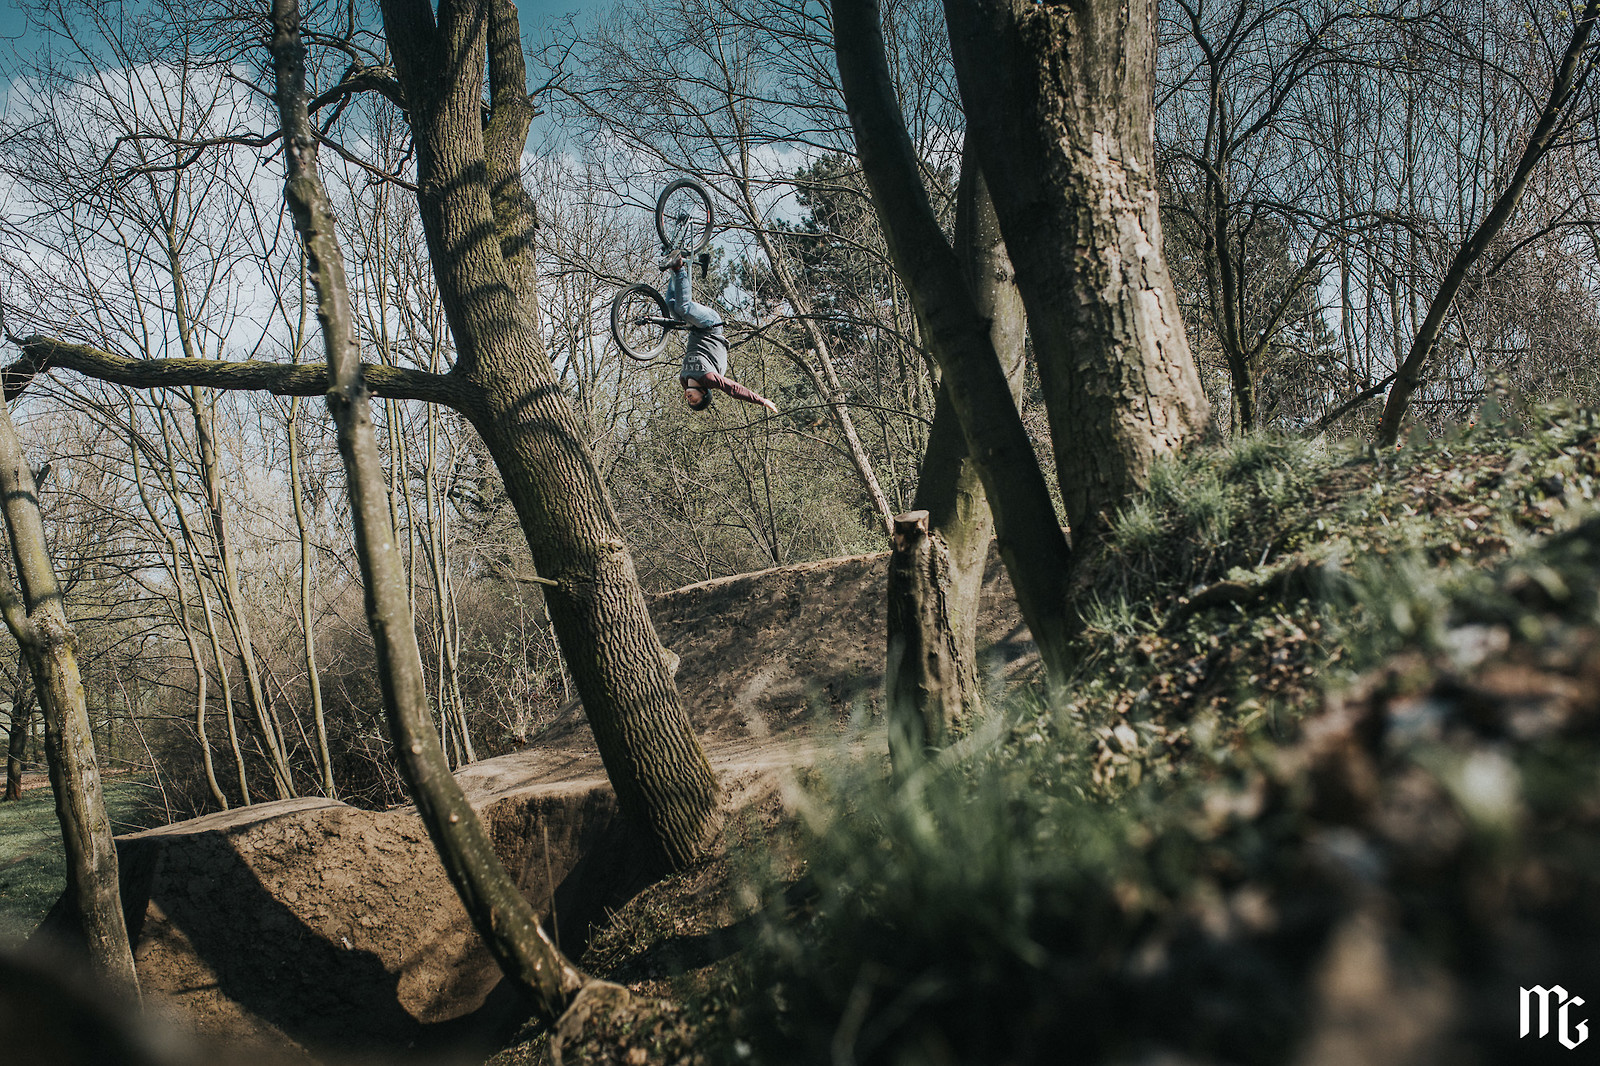 backflip oldie on step up - Kick!Photo - Mountain Biking Pictures - Vital MTB